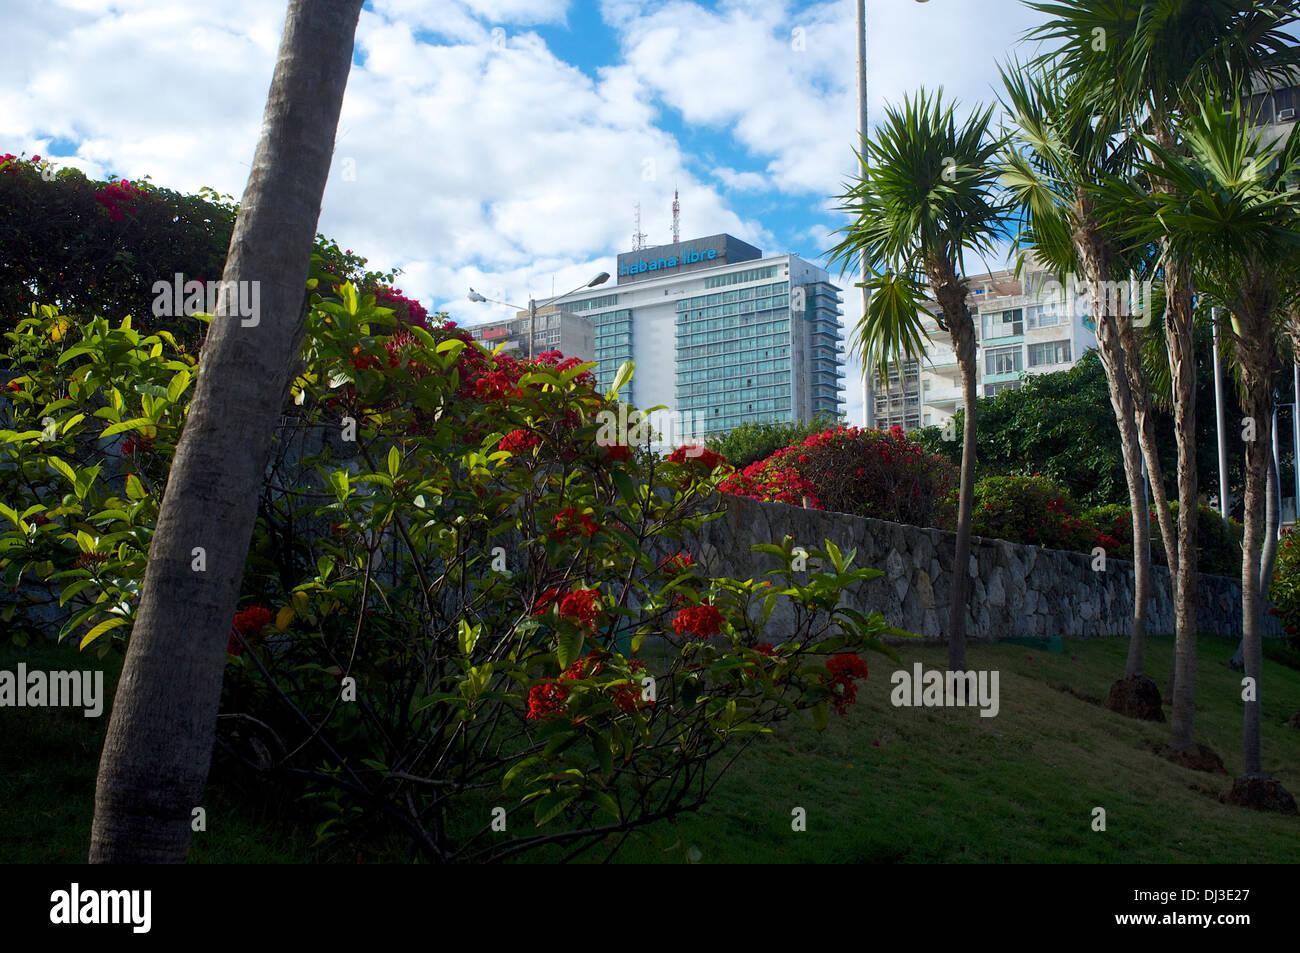 Hotel Cuba Libre, Havana, Cuba - Stock Image